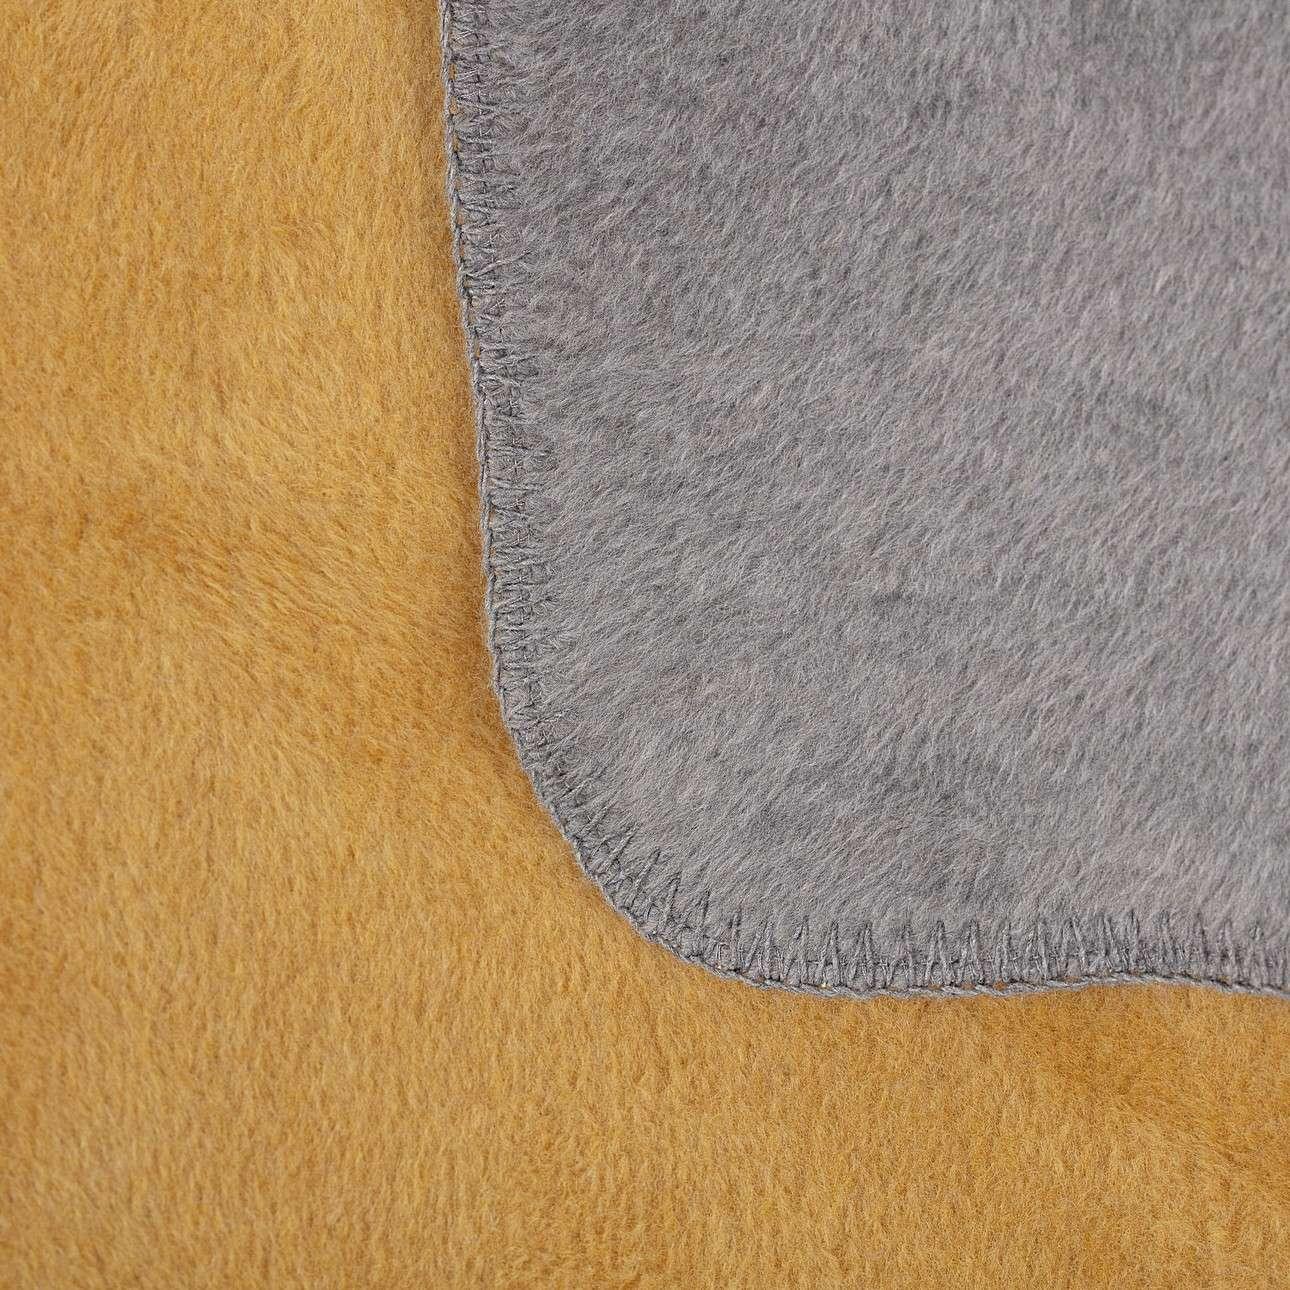 Cotton Cloud  Blanket 150x200cm  Mustard&Grey